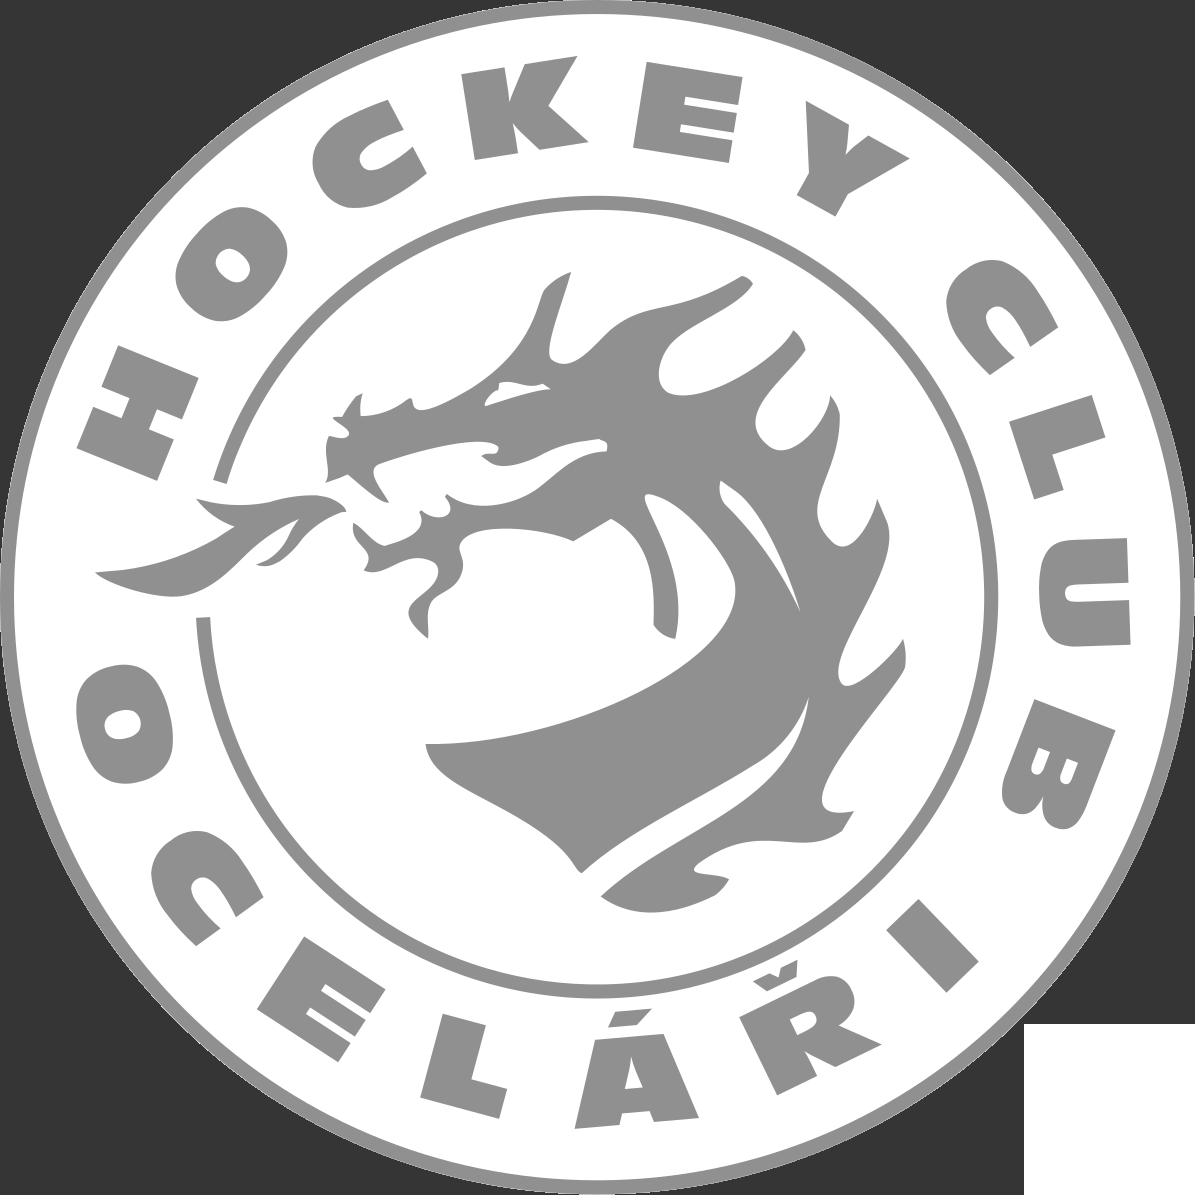 reference - hc ocelari